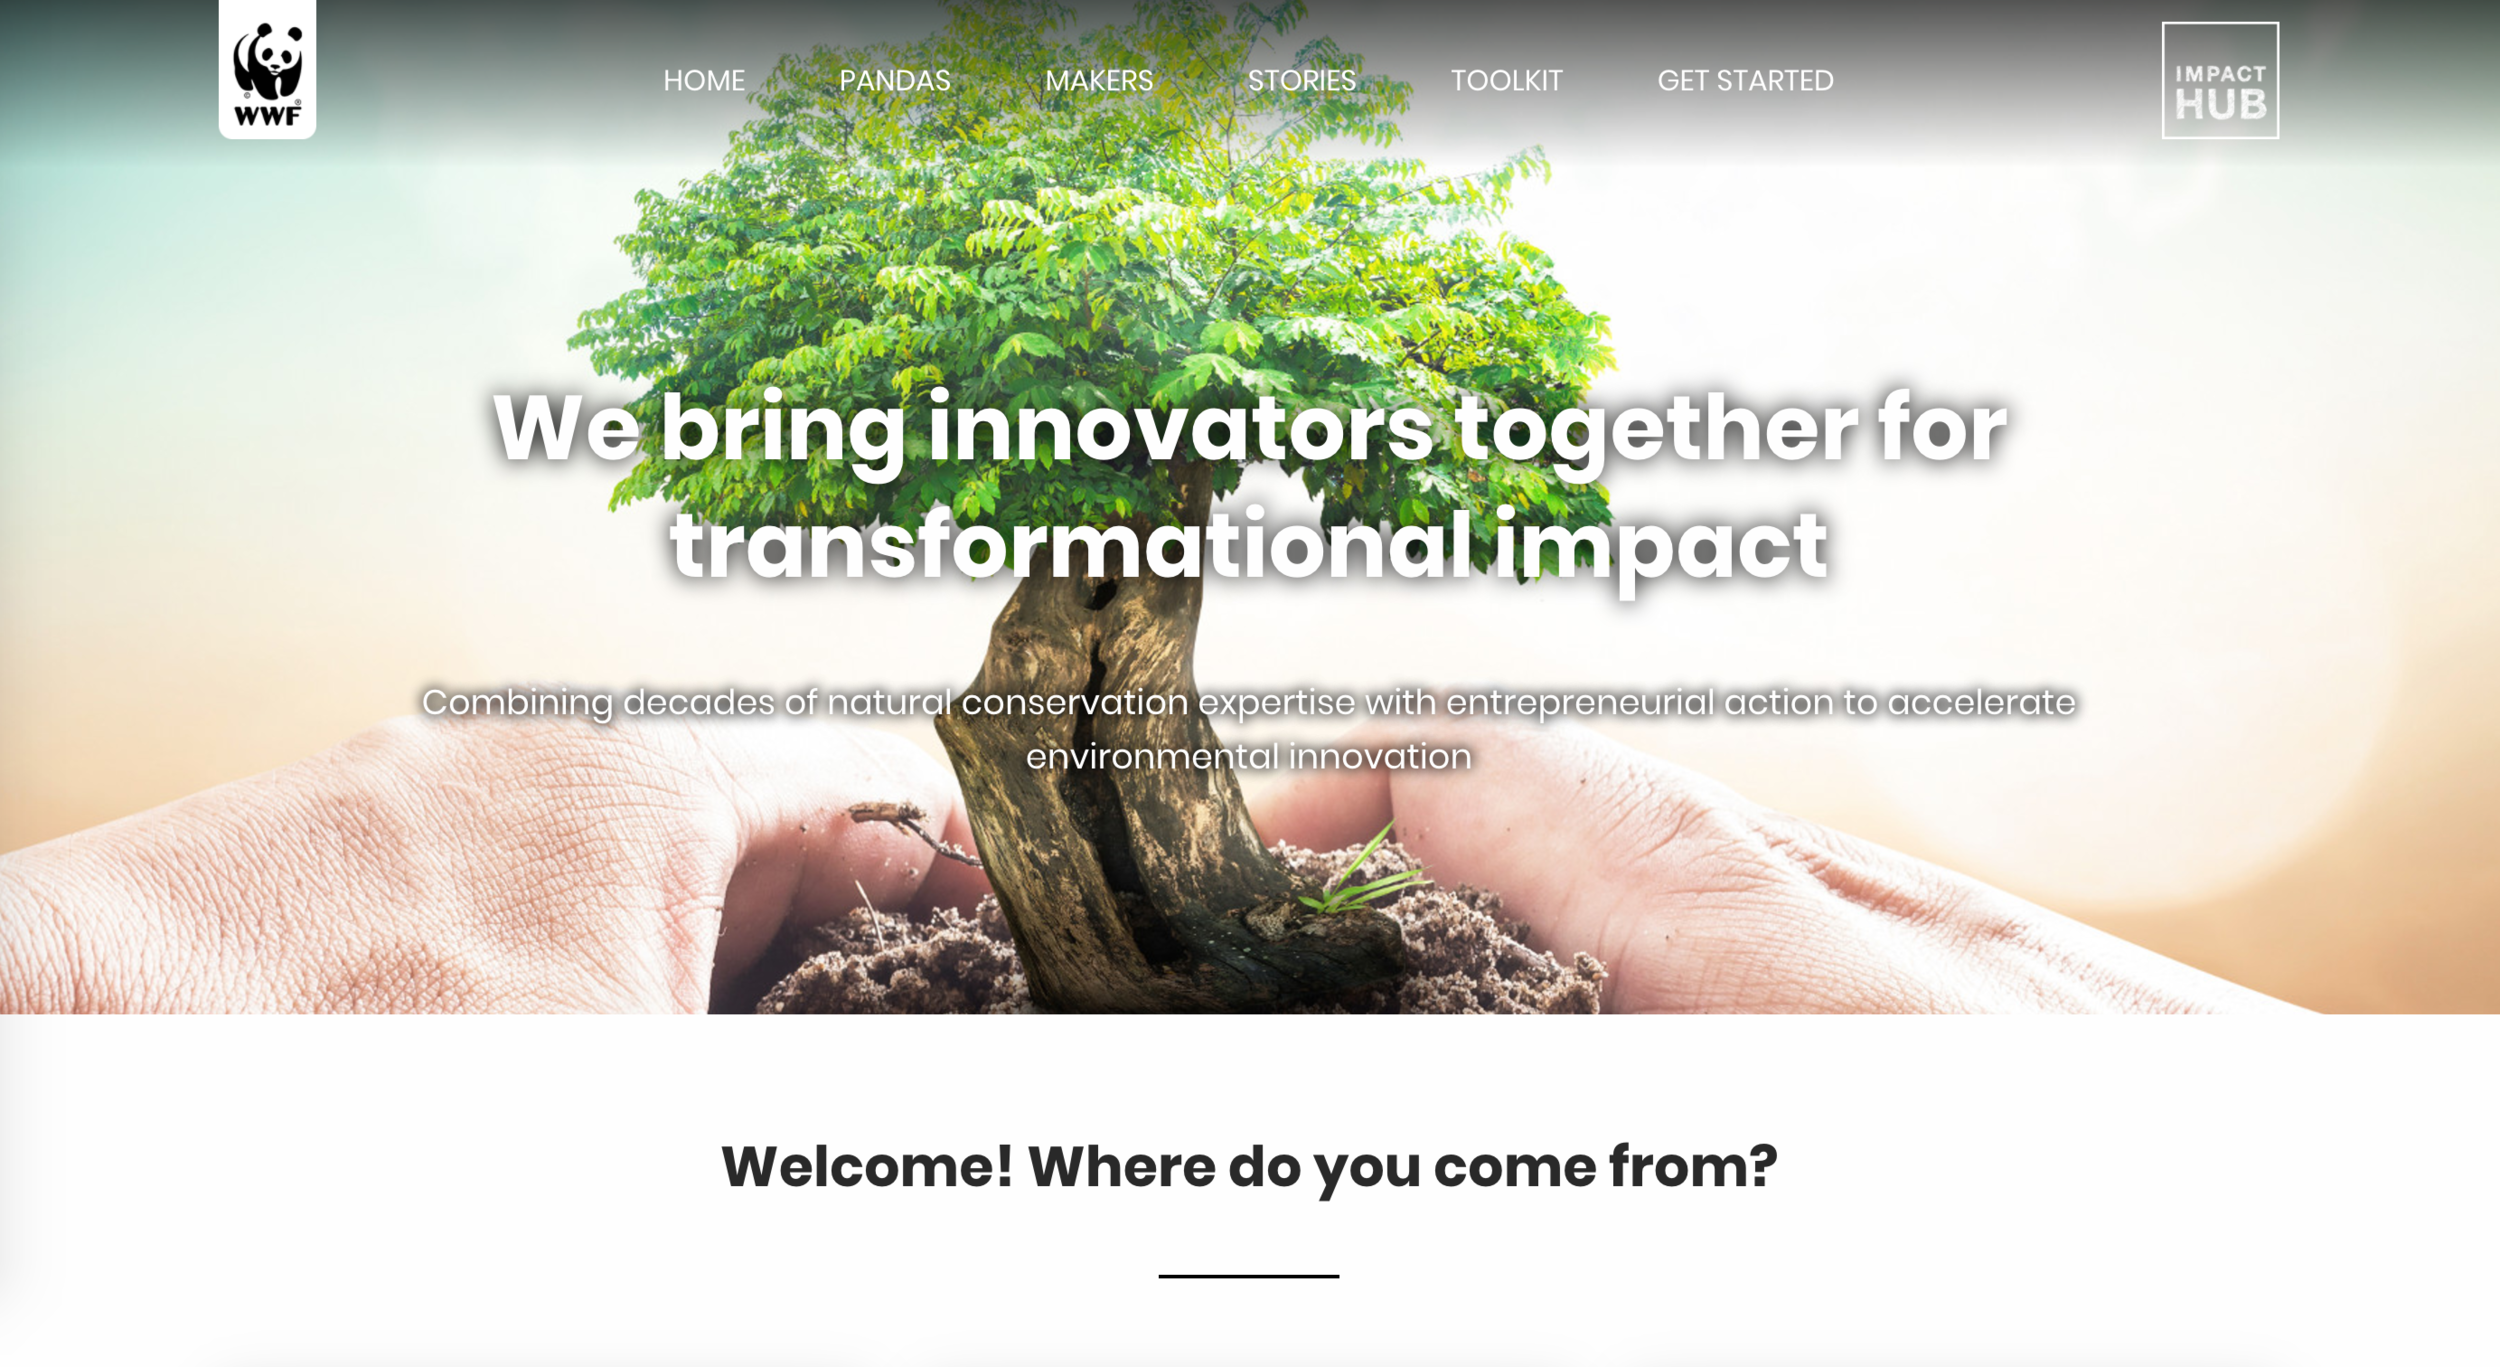 WWFとImpact HUBのグローバルパートナーシップについてのサイト